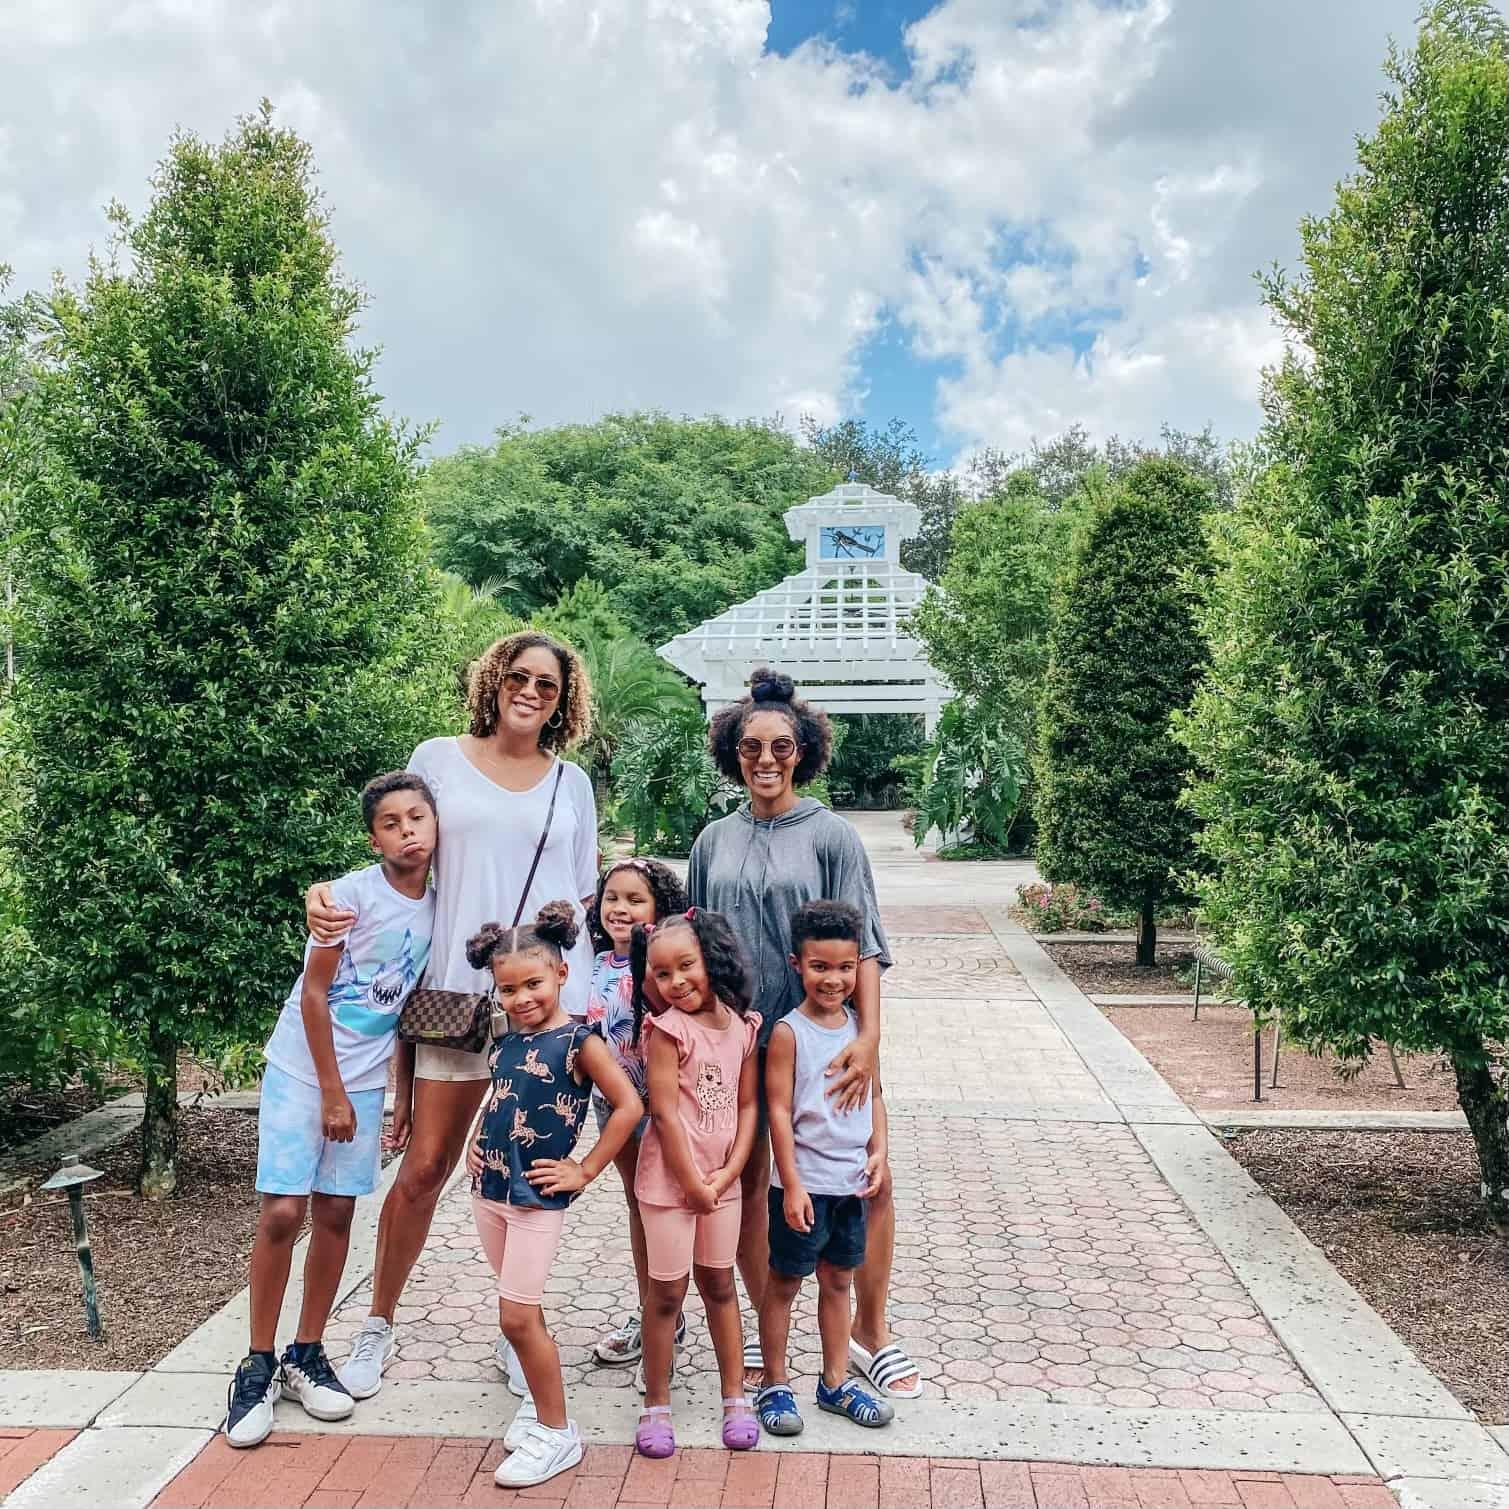 Family at Harry P LEAU Gardens gulf coast moms love to visit Orlando